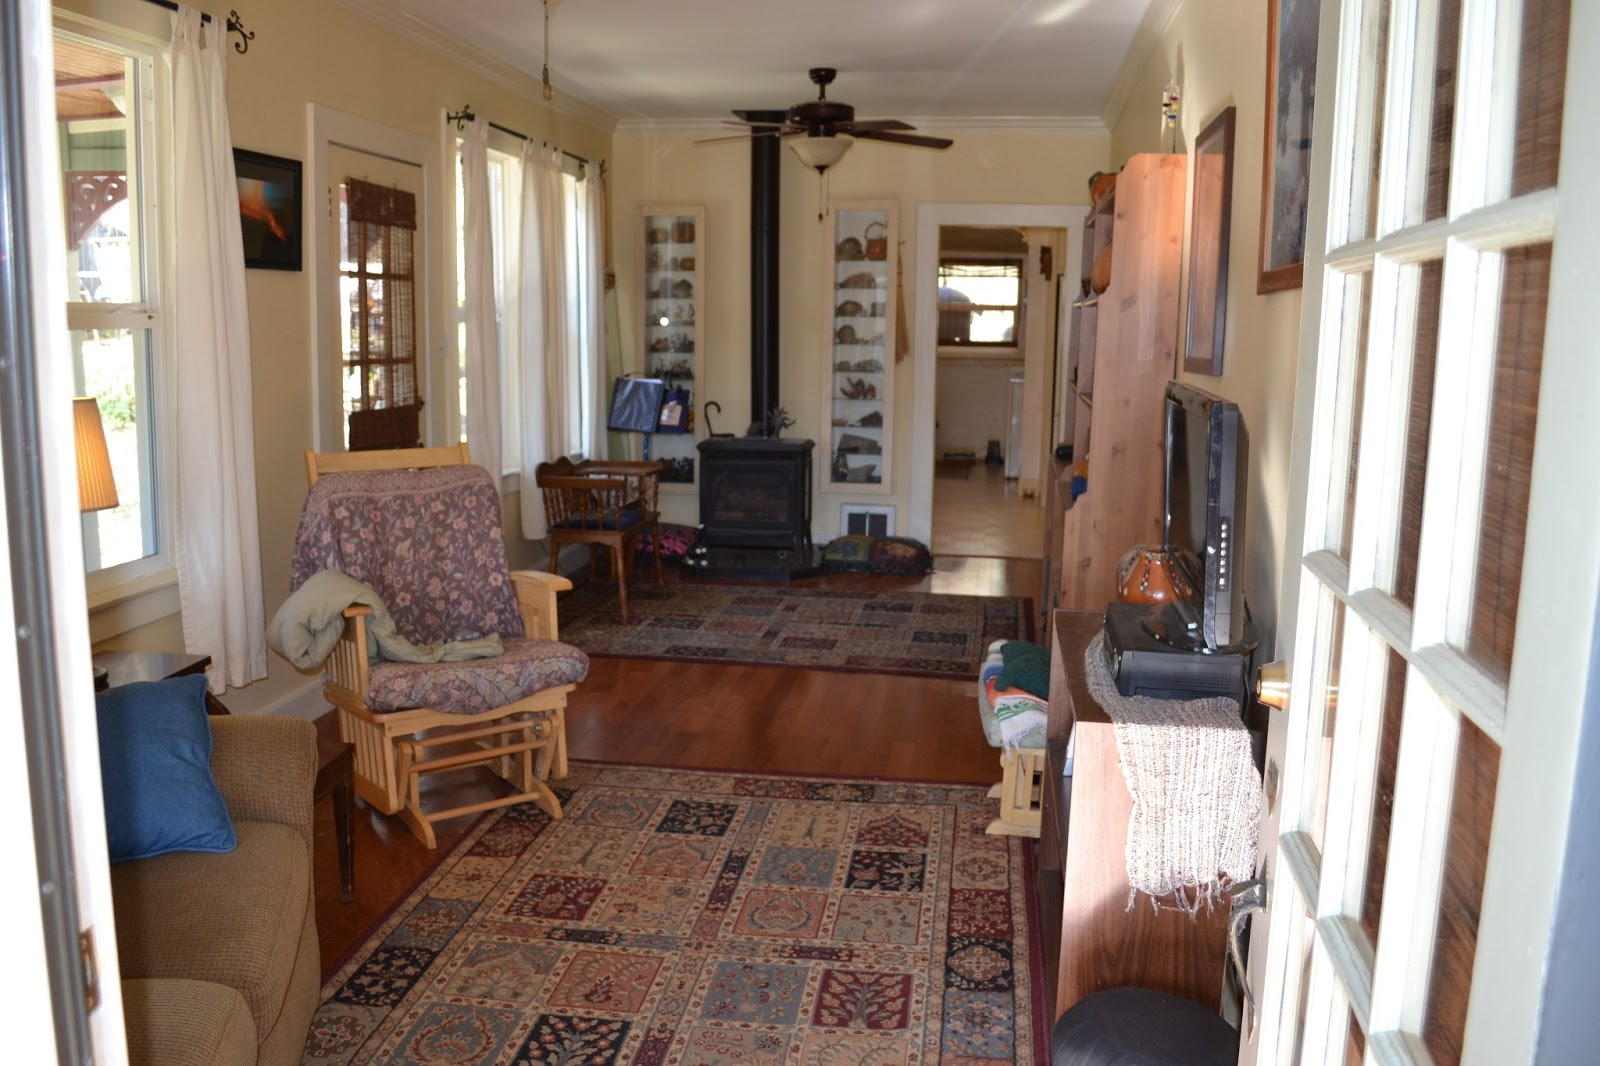 Scott Hopper S Blog Downtown Grass Valley Home For Sale